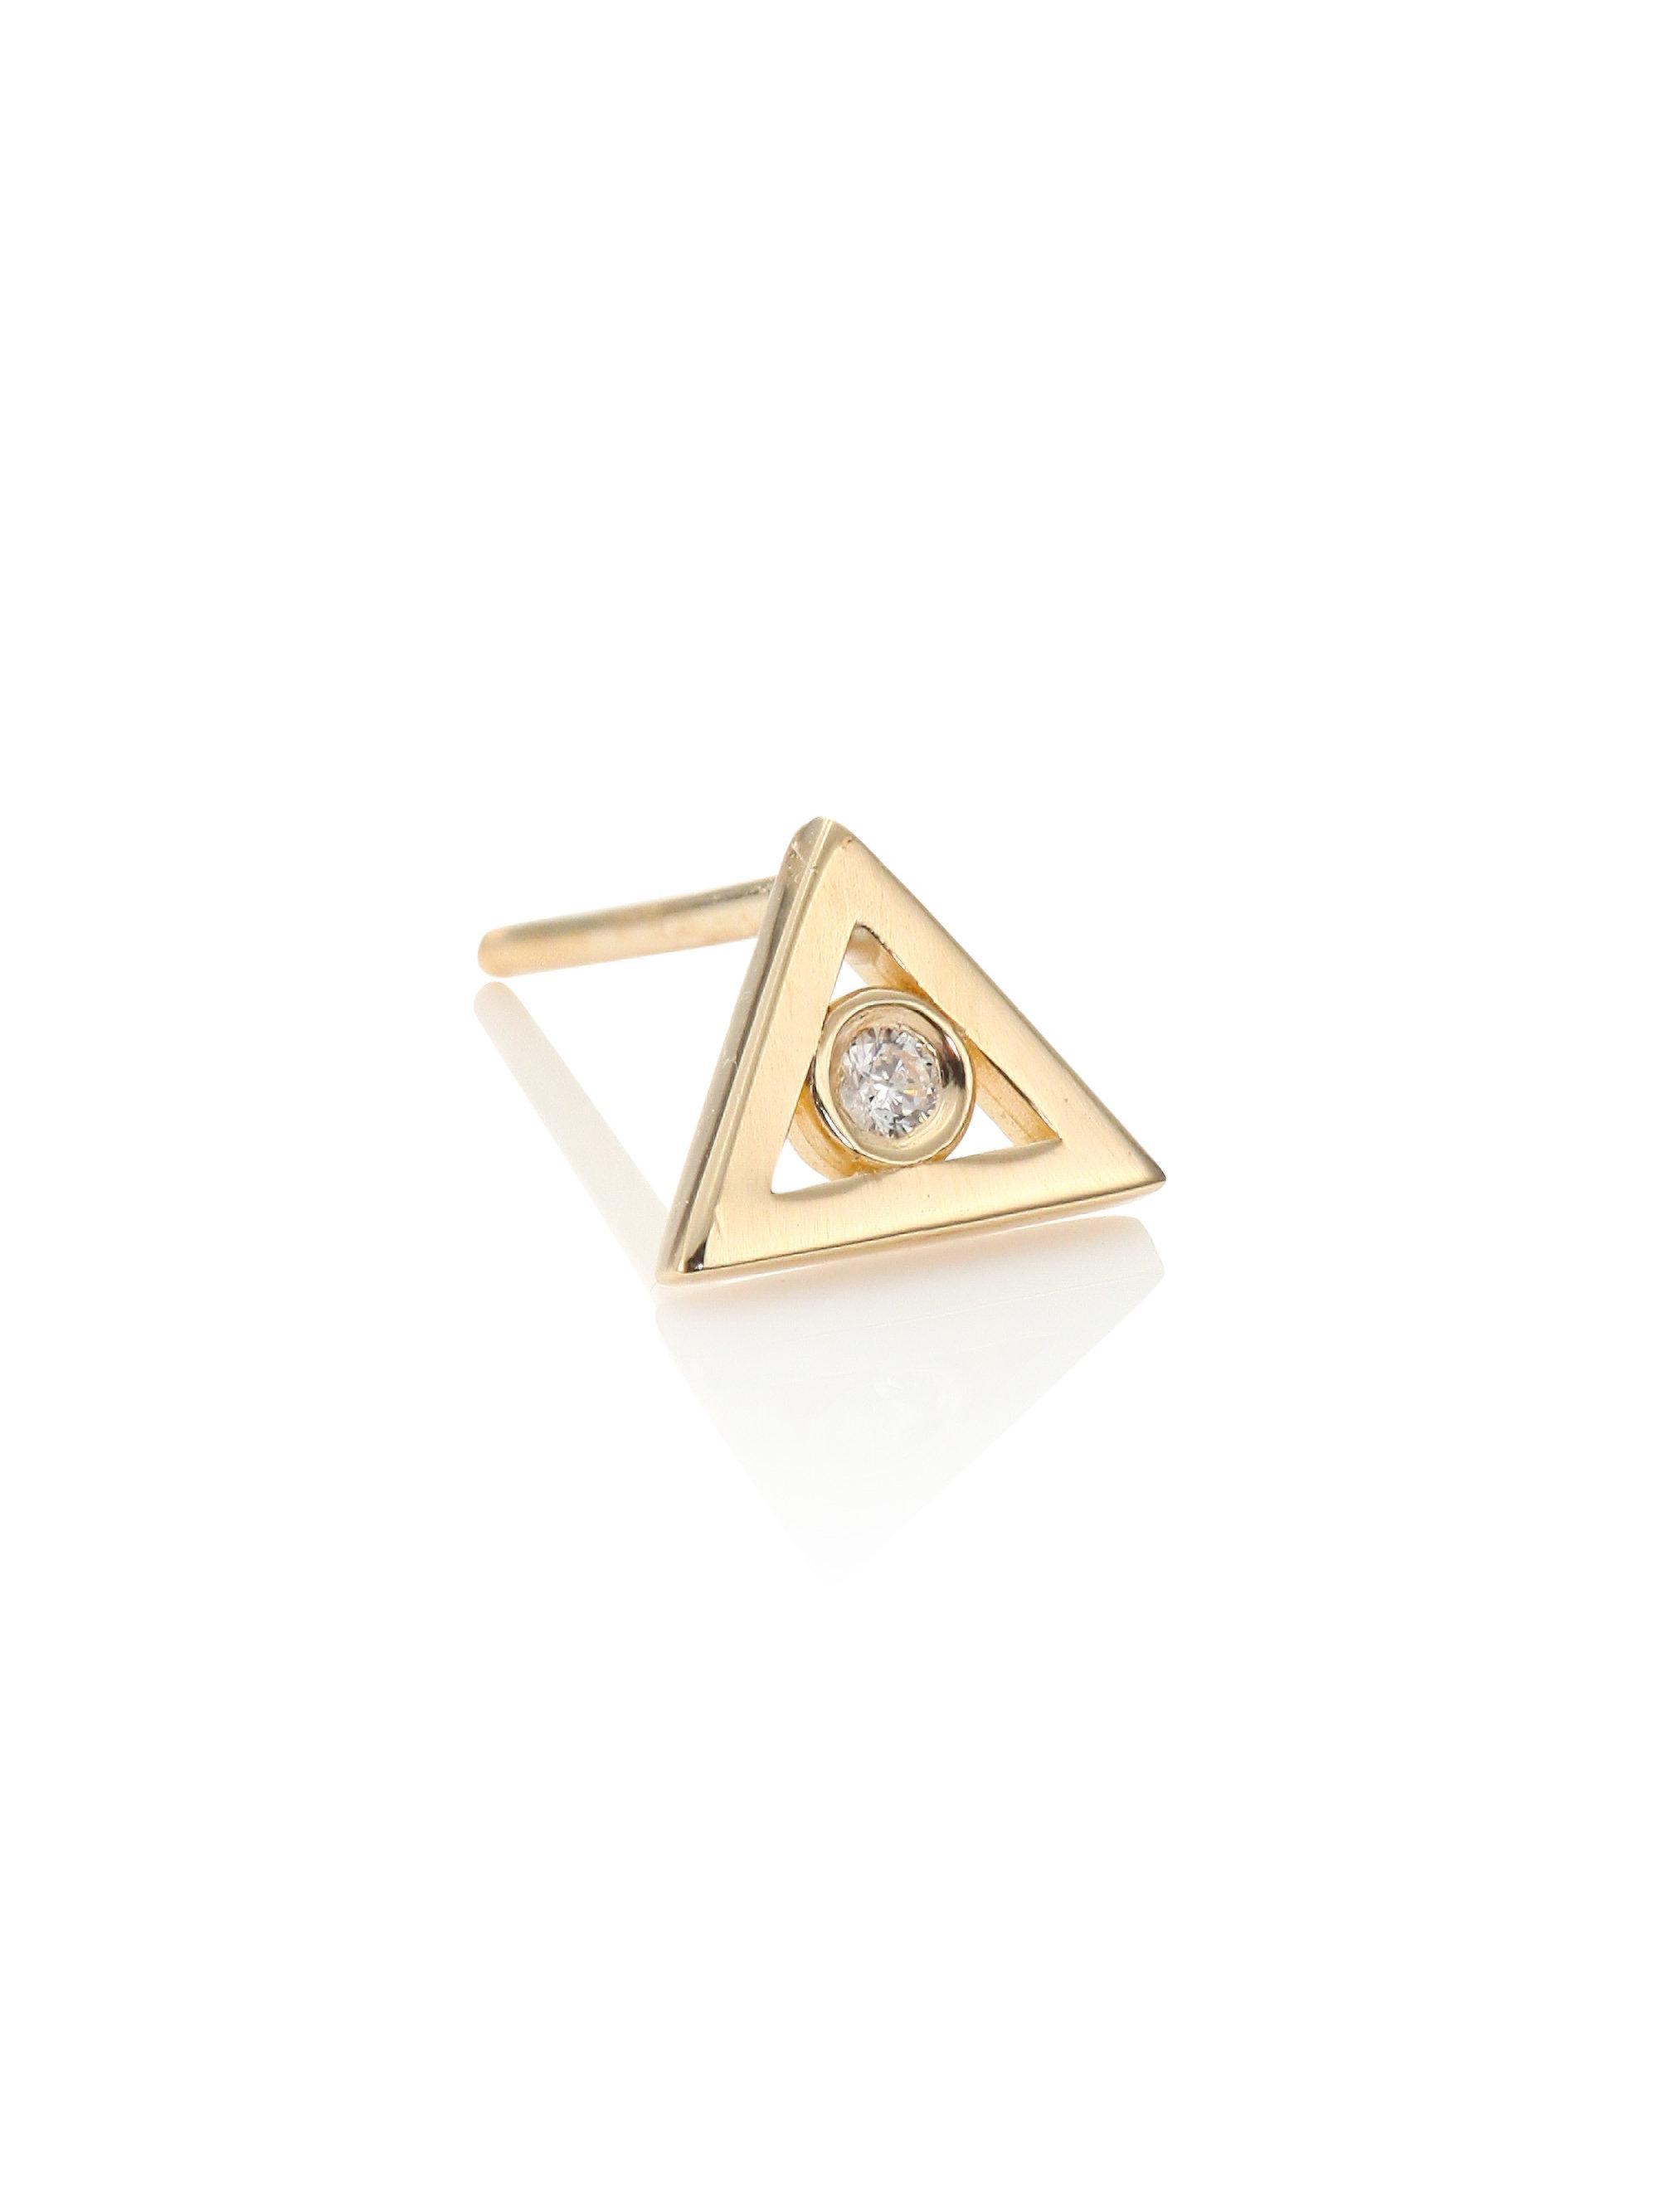 Sydney Evan 14K Gold Triangle Stud Earring with Diamonds YrsB64Wz7